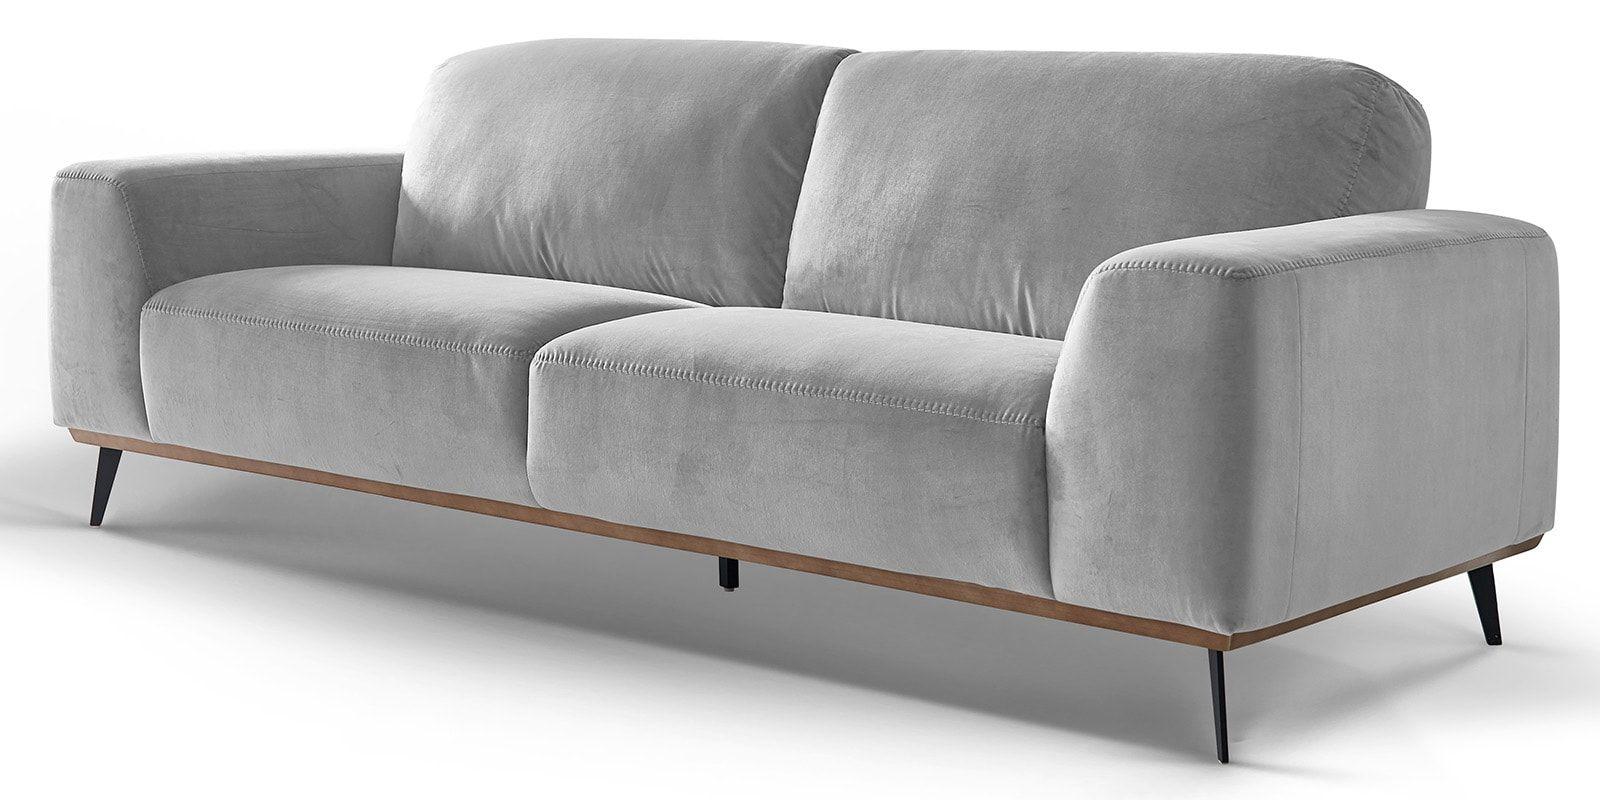 Skandi Design 3 Sitzer Ledercouch Holzrahmen Barcelona Comfort2home Couch Ledercouch Bequemes Sofa